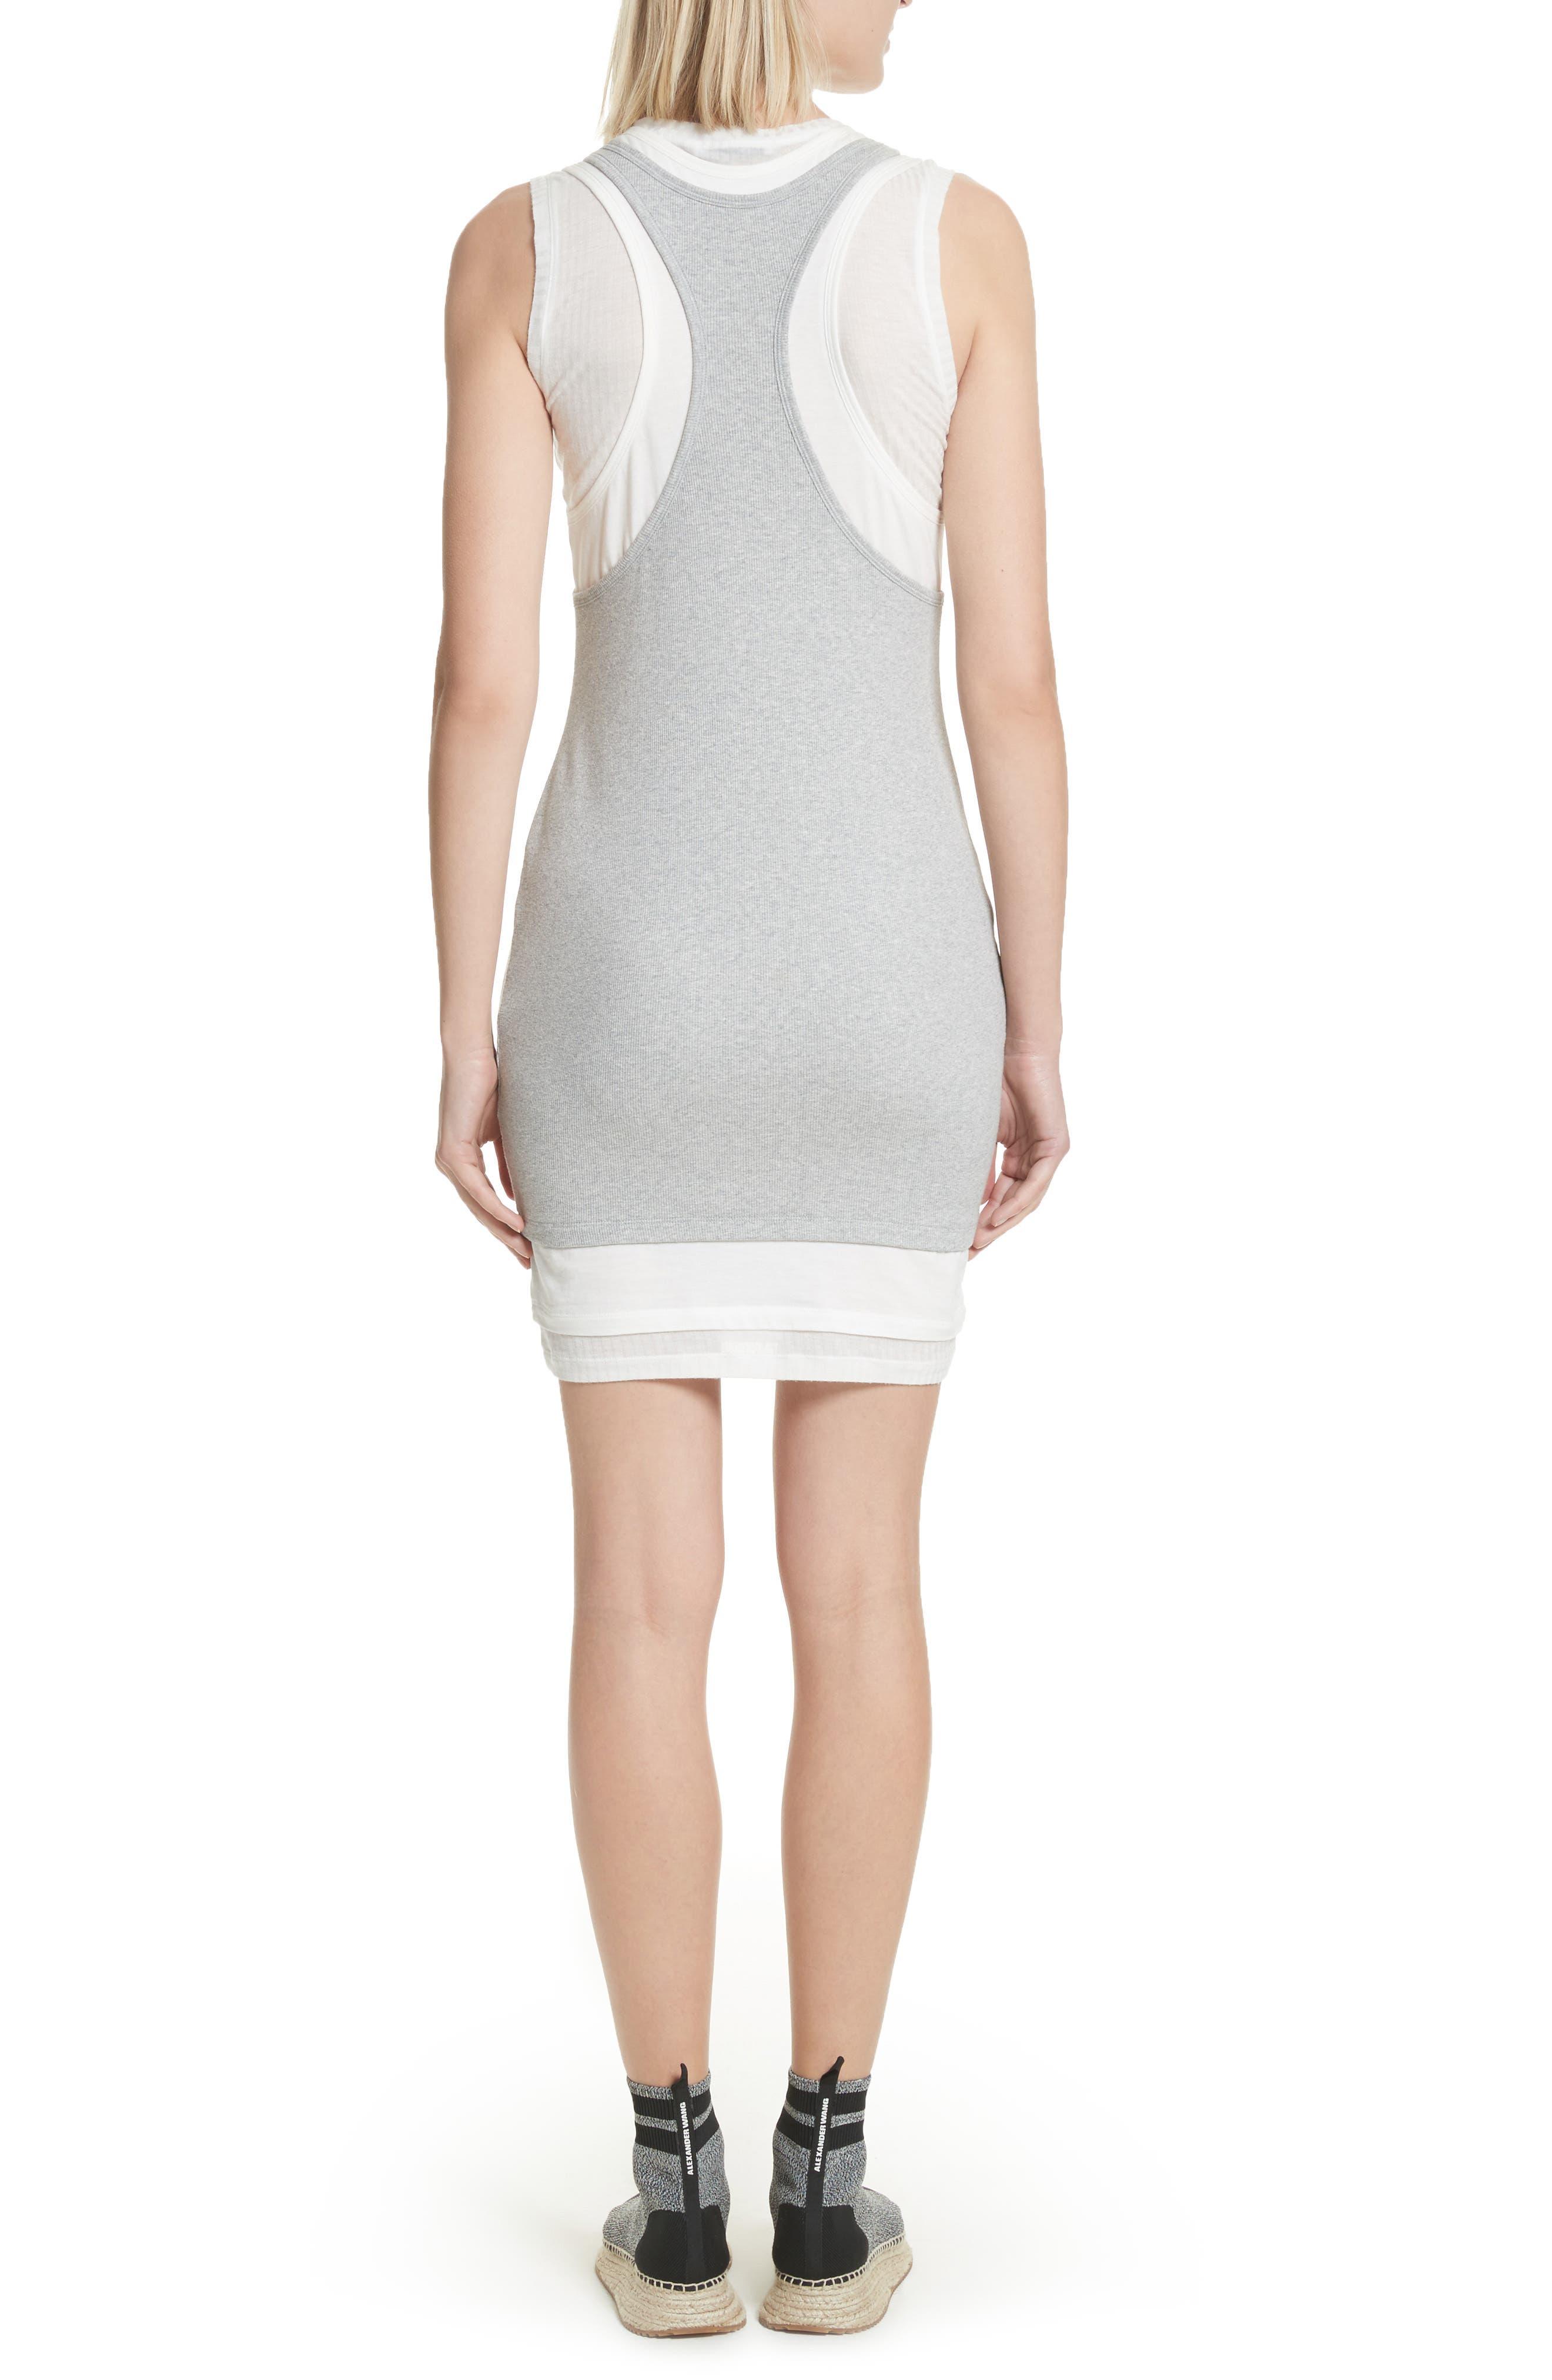 Alexander Wang Layered Mixed Media Dress,                             Alternate thumbnail 2, color,                             Heather Grey Off White